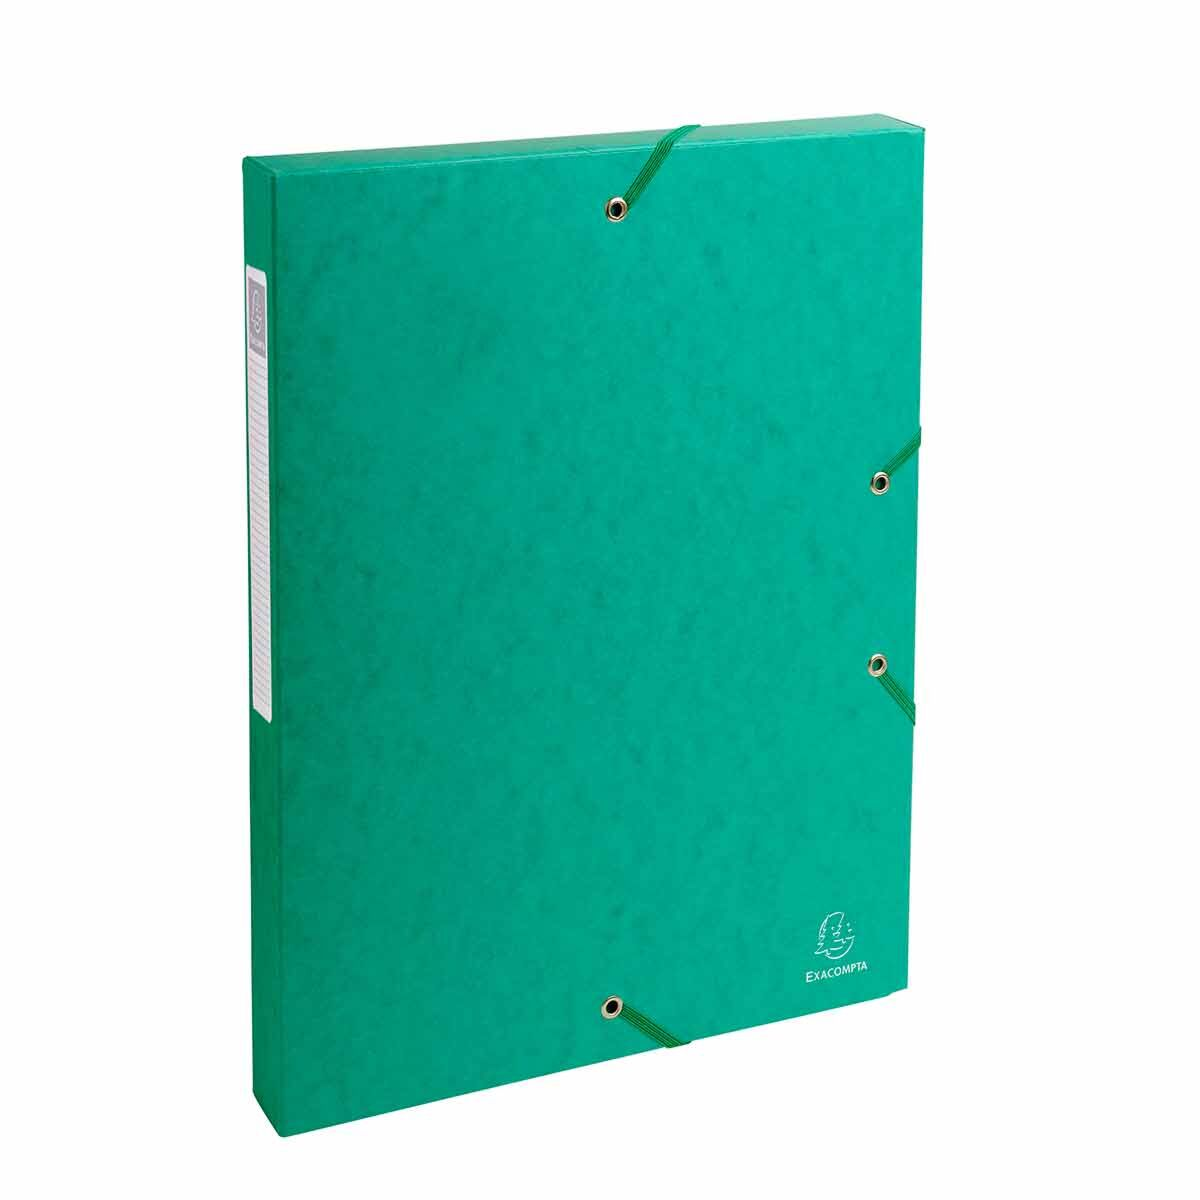 Exacompta Elasticated Box File Pressboard A4 25mm Pack of 8 Green